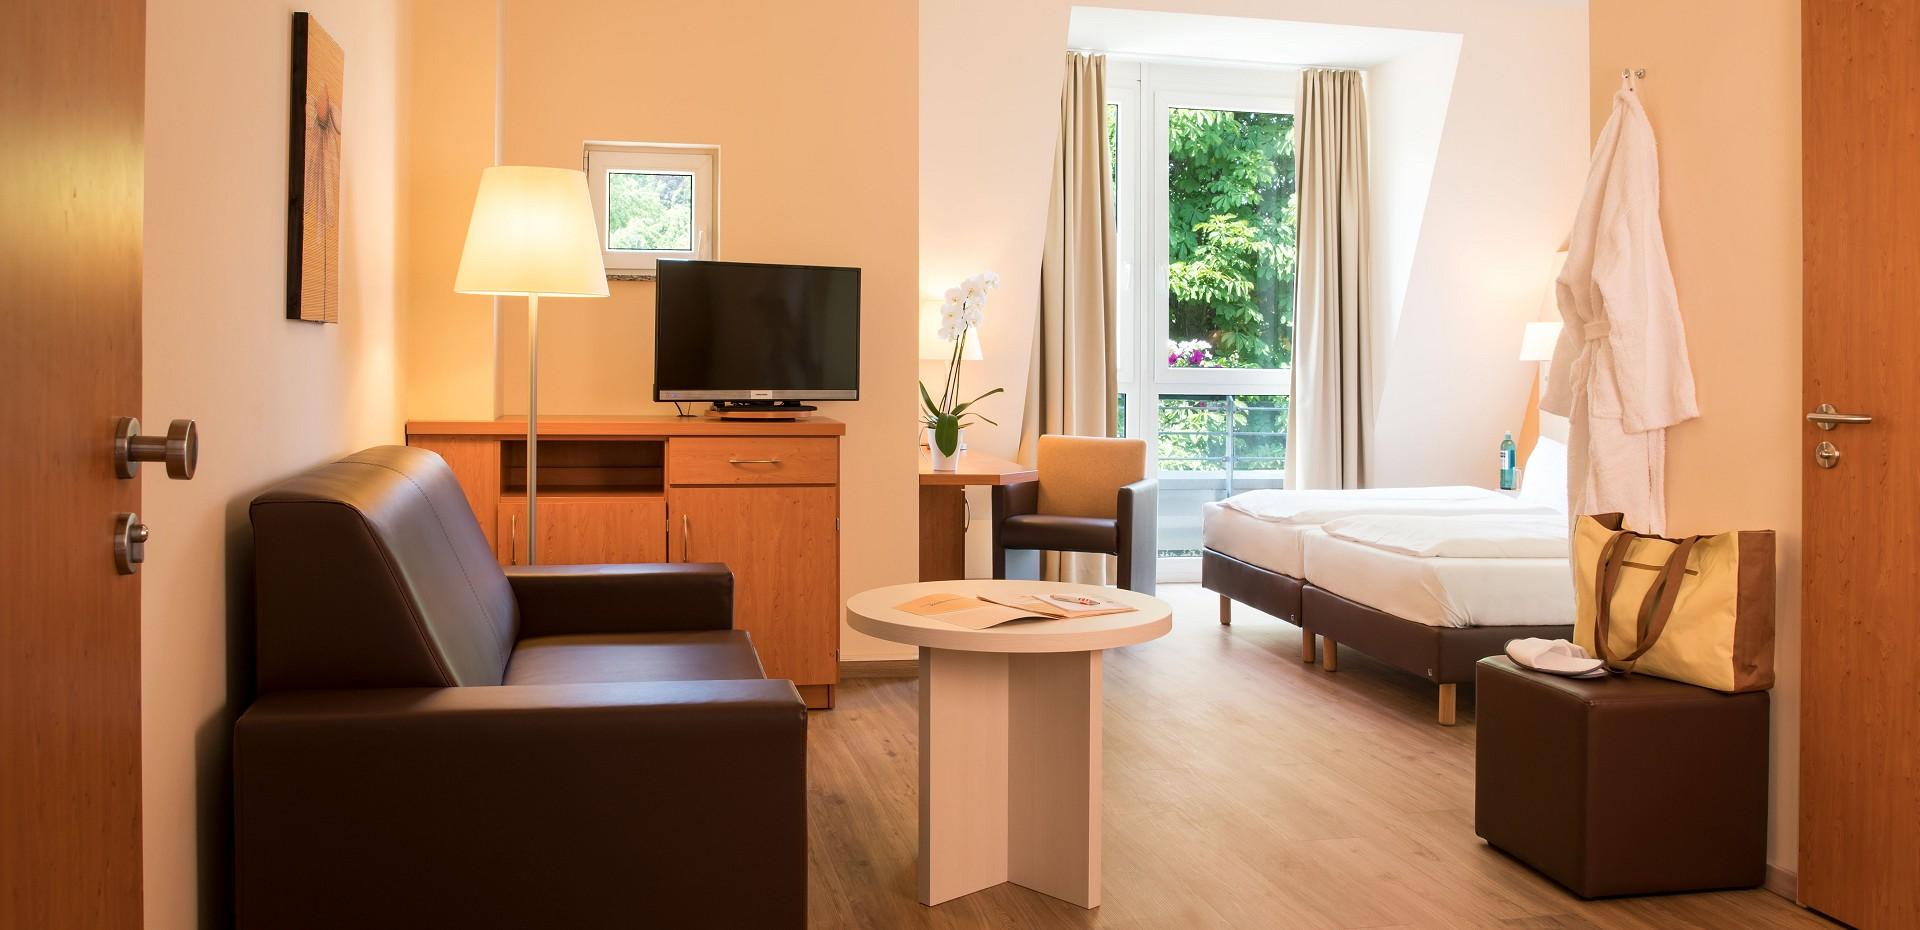 Hotel Bad Hersfeld Thermalis